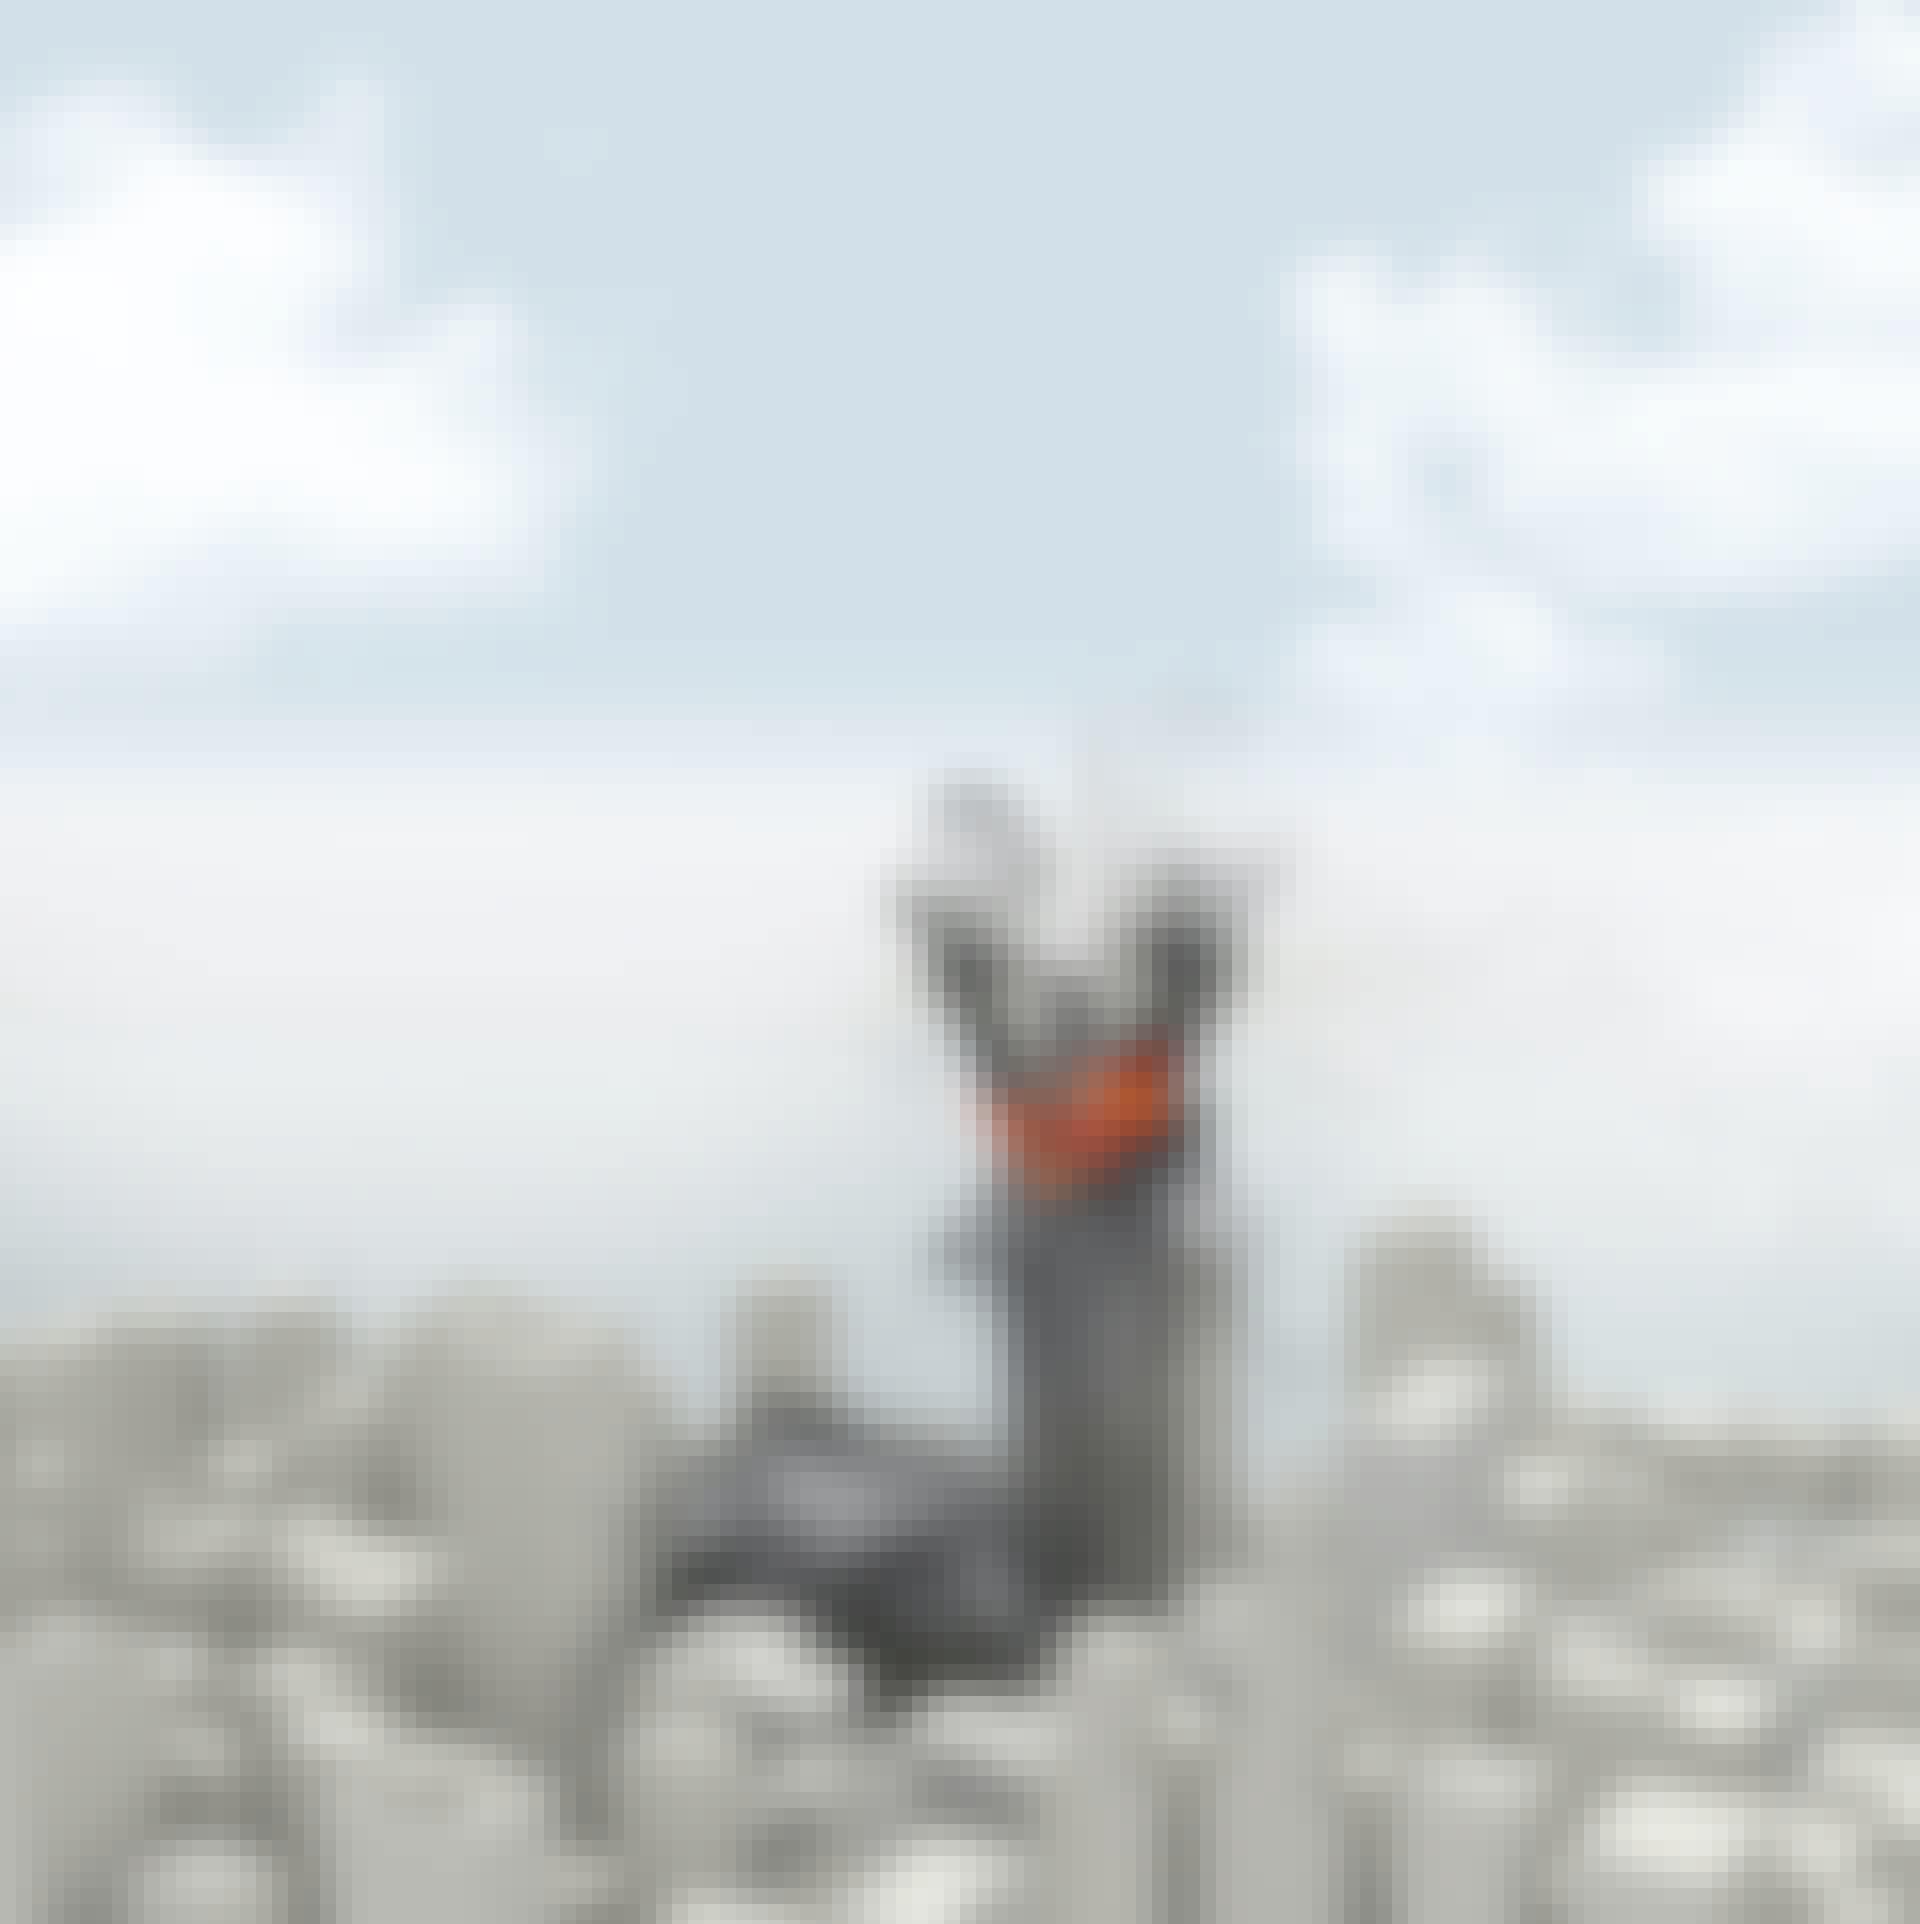 Tornit sortuvat: Vaihe 5